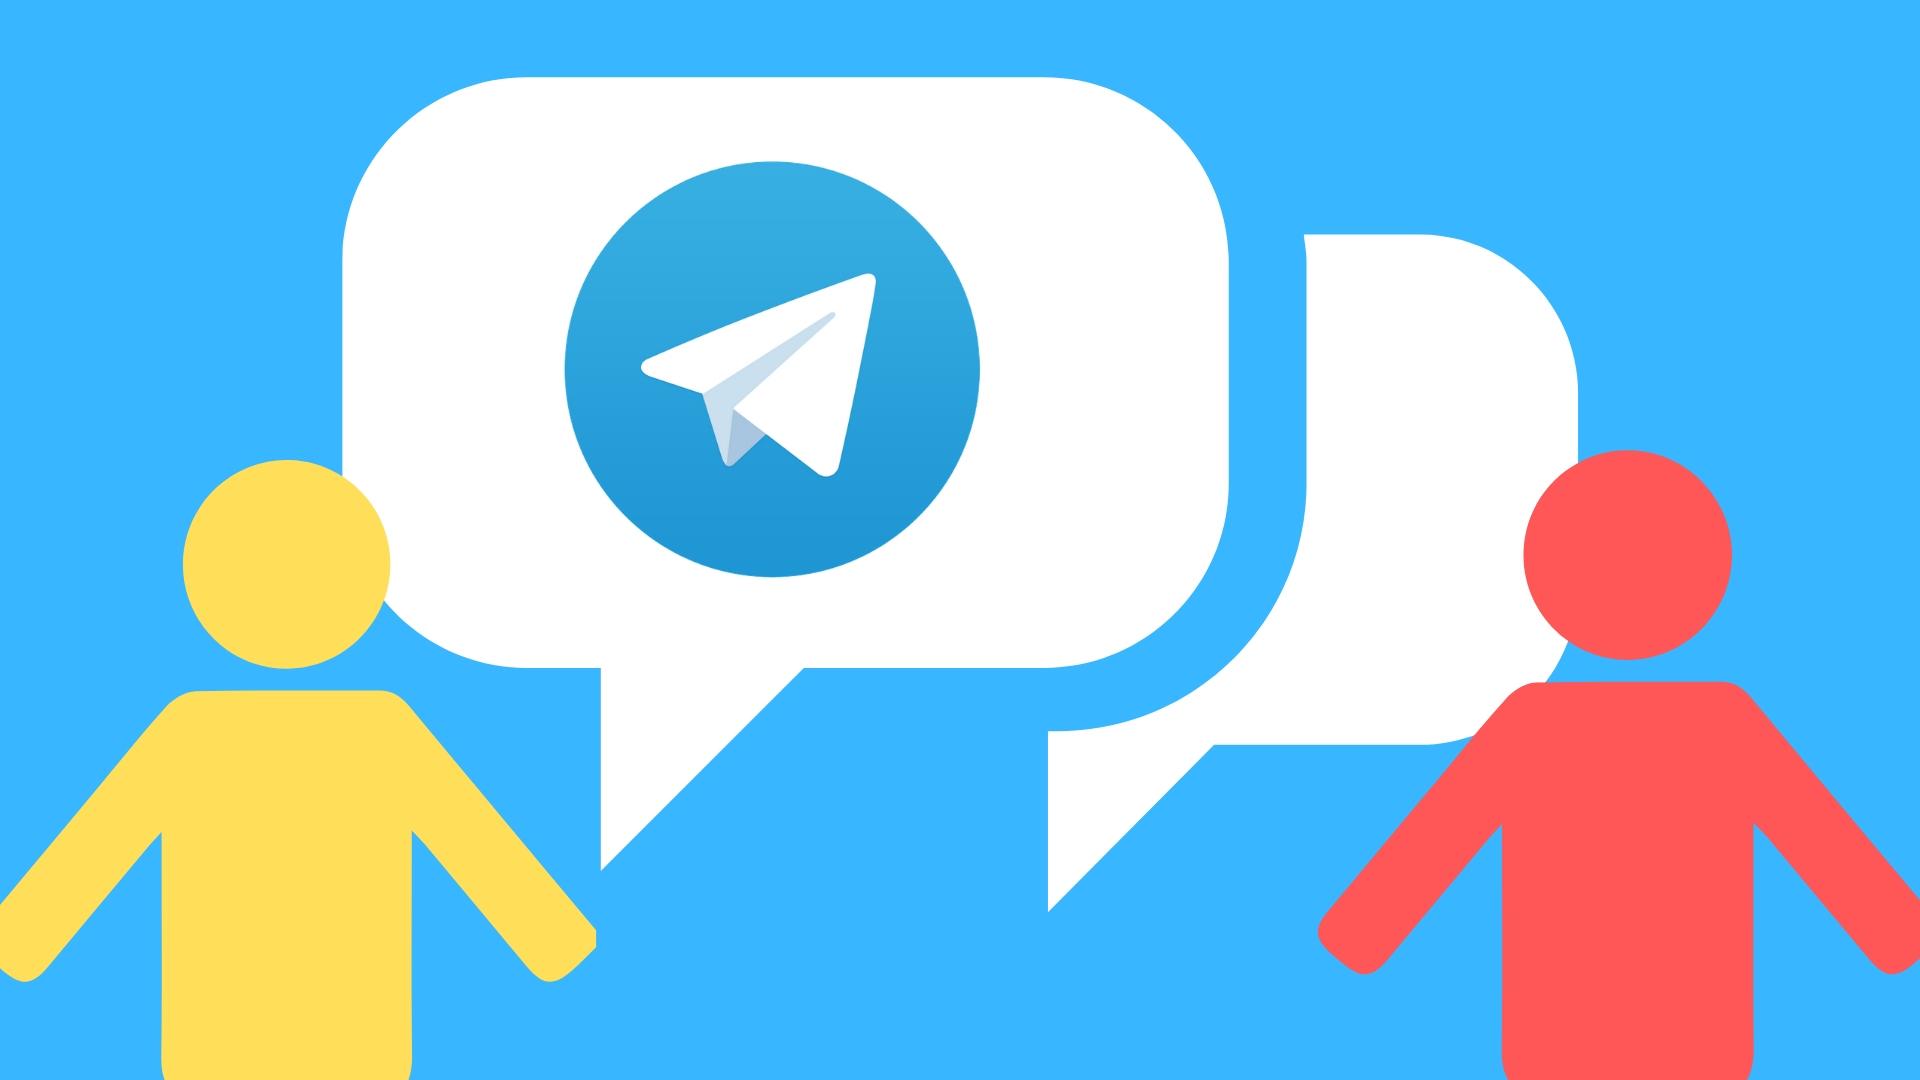 Рисунок — переписка в Телеграм